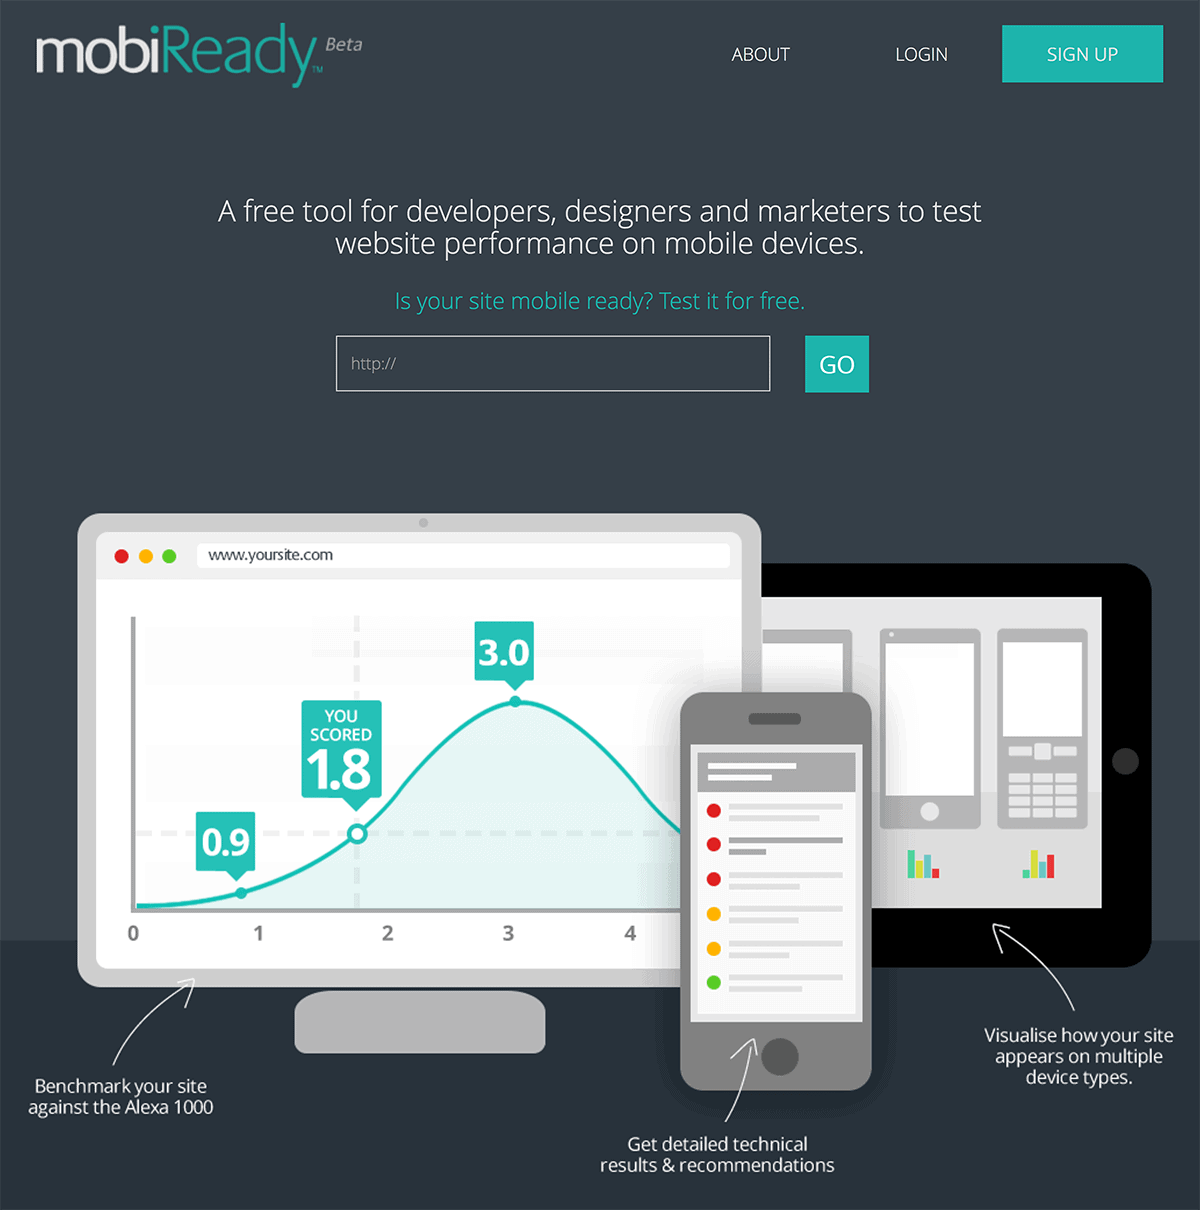 MobiReady